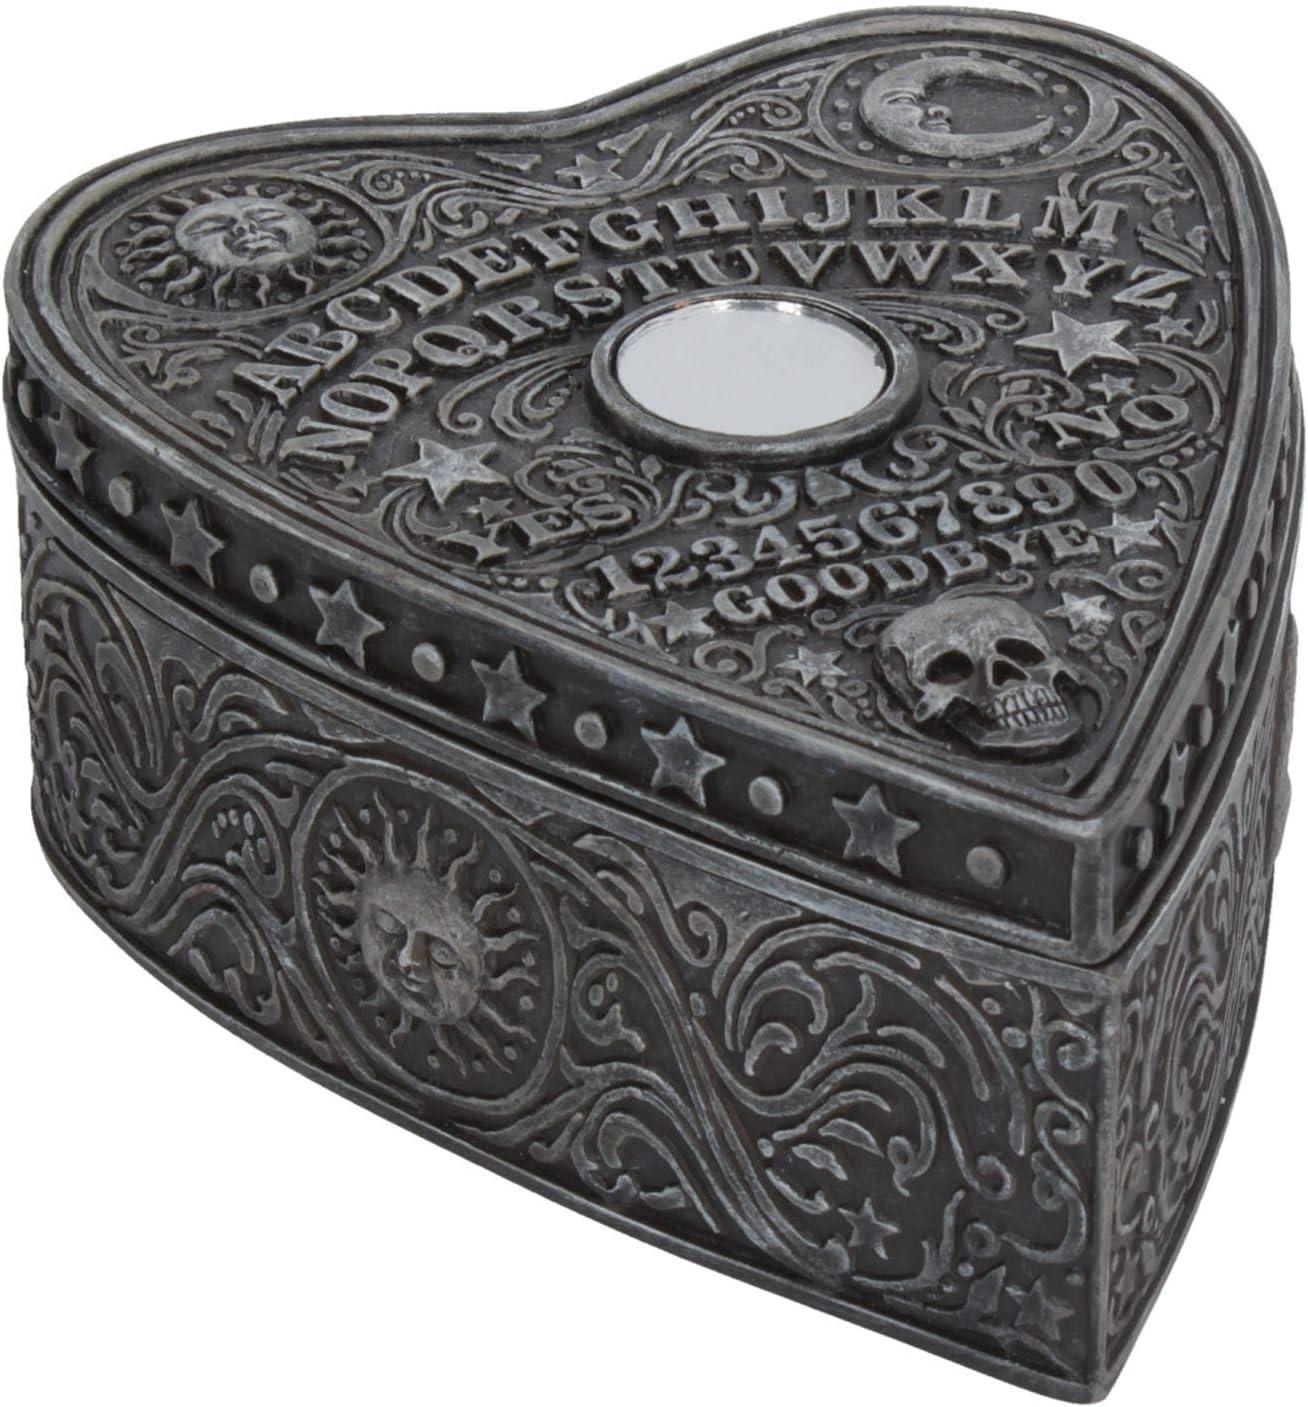 Nemesis Now Dedication Atlanta Mall B4329M8 Spirit Board Black Box 9cm